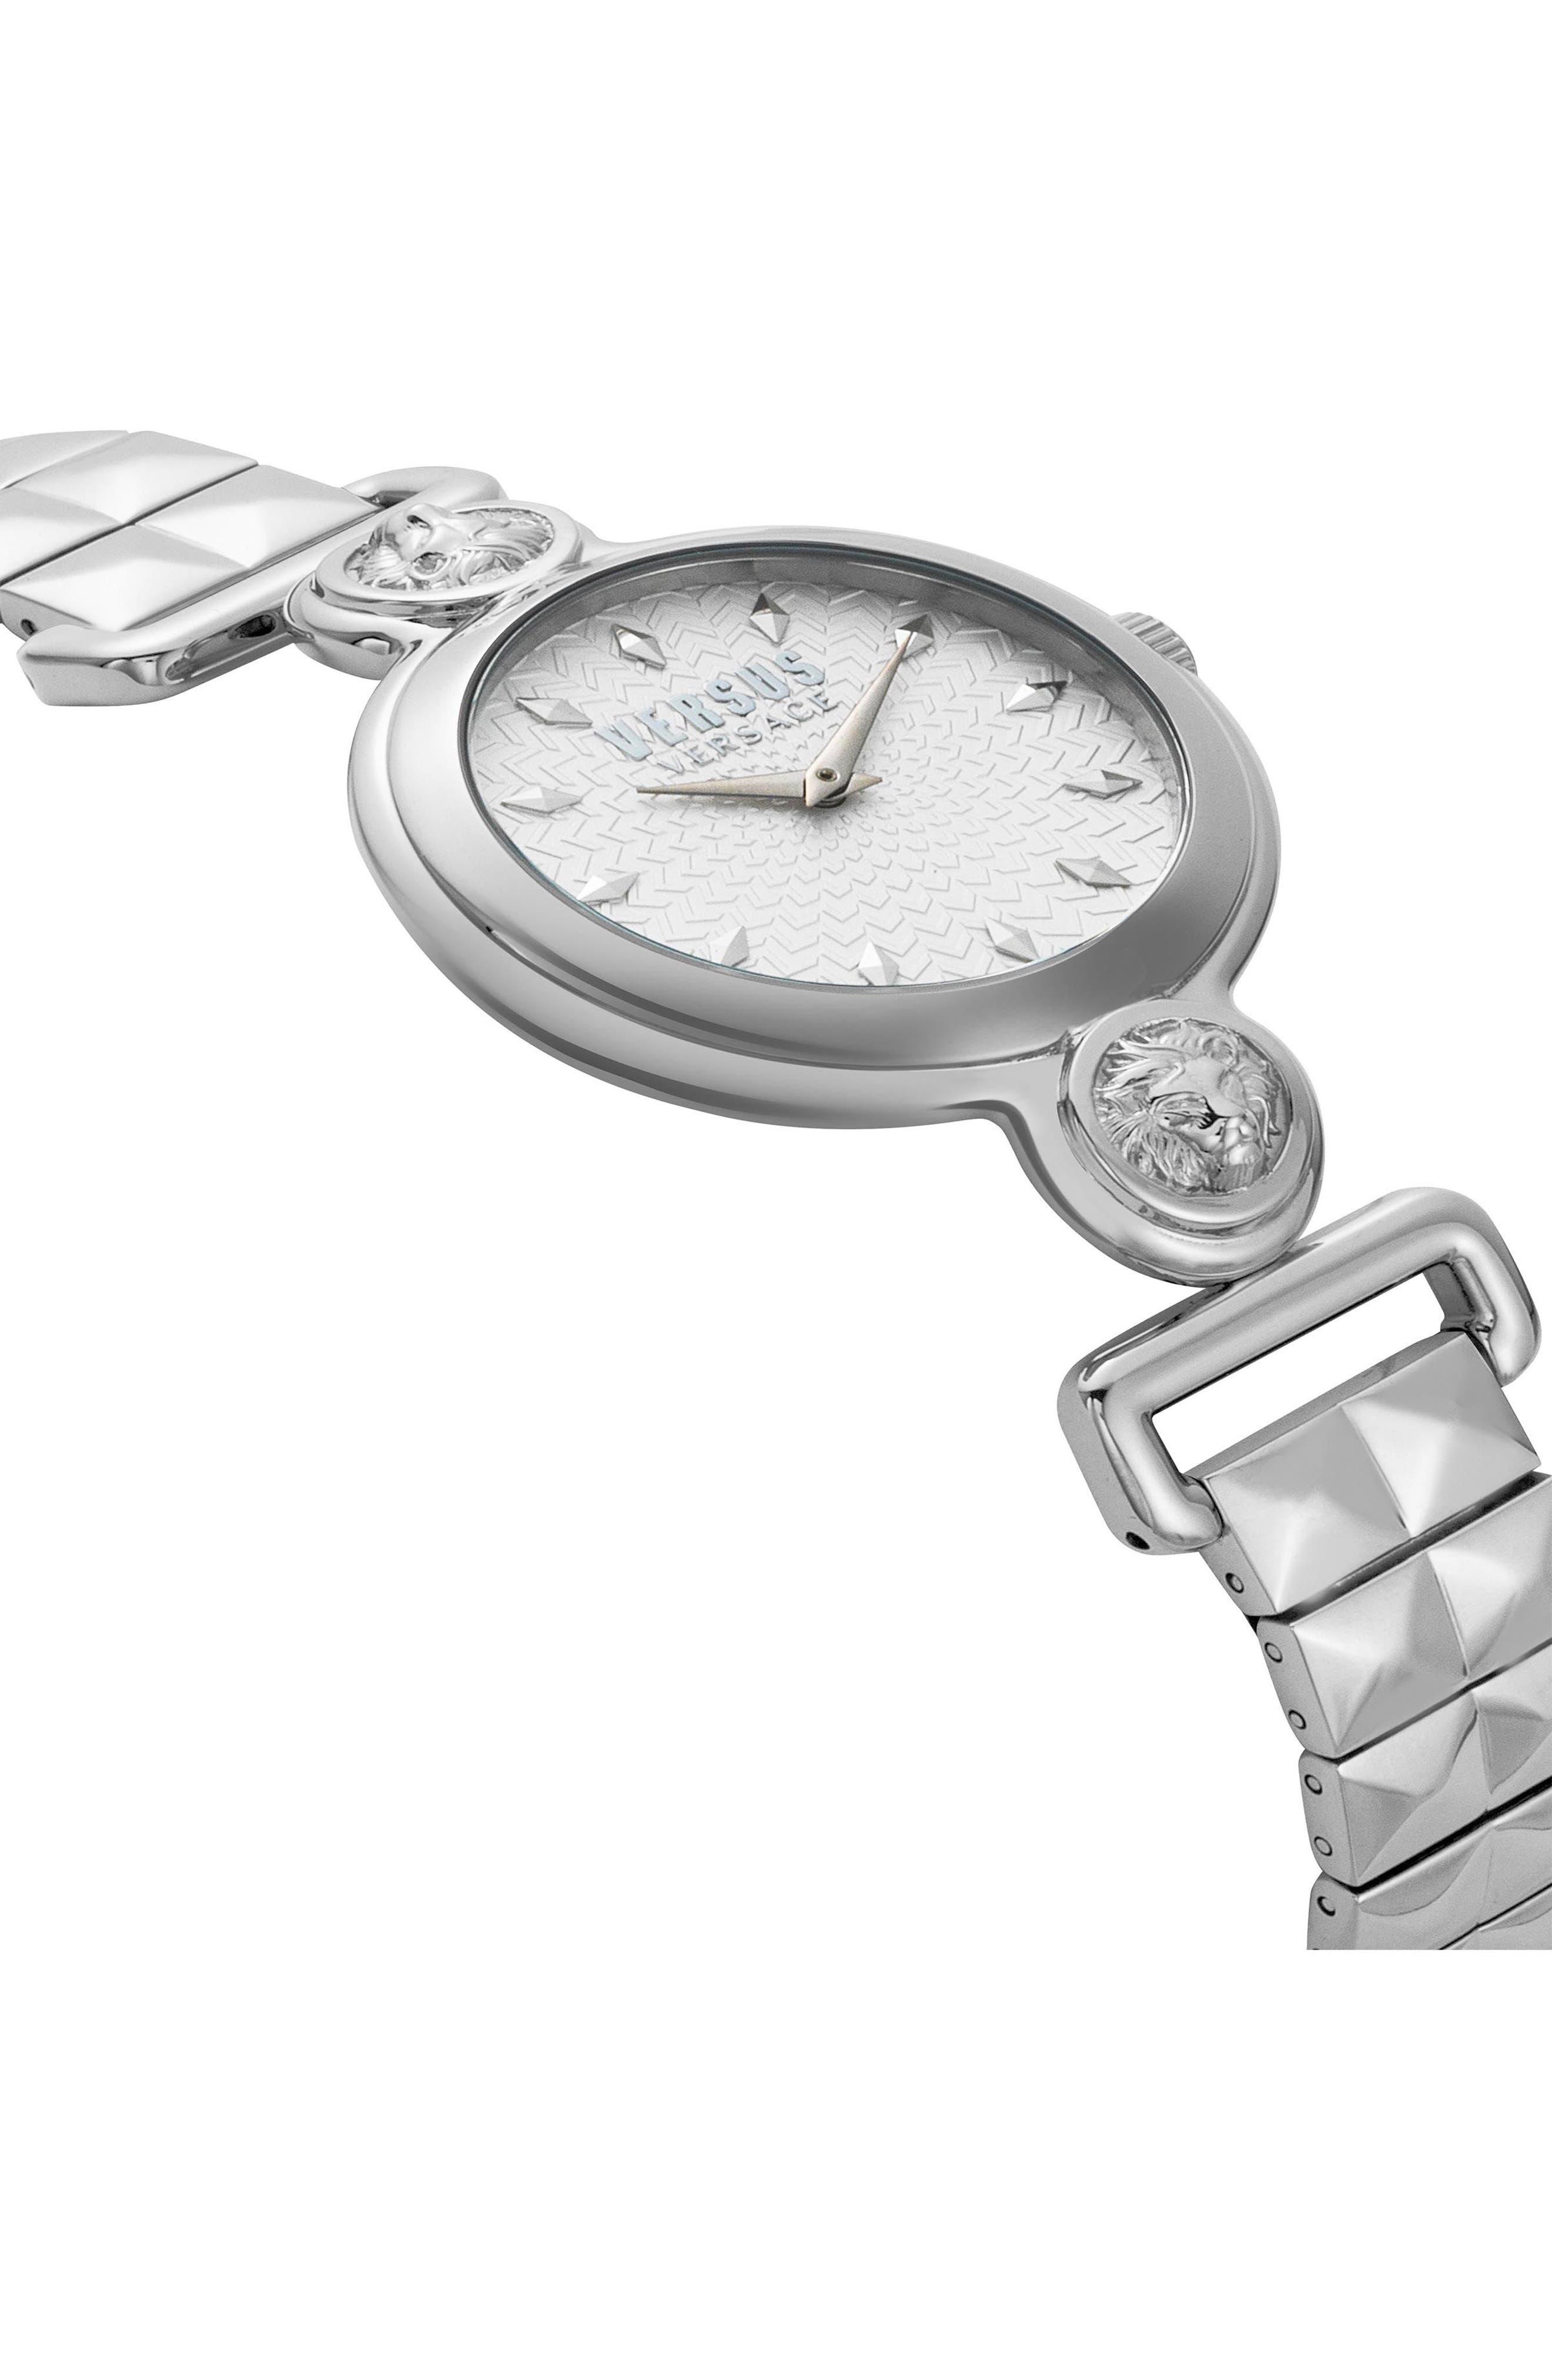 VERSUS by Versace Sunnyridge Bracelet Watch, 34mm,                             Alternate thumbnail 7, color,